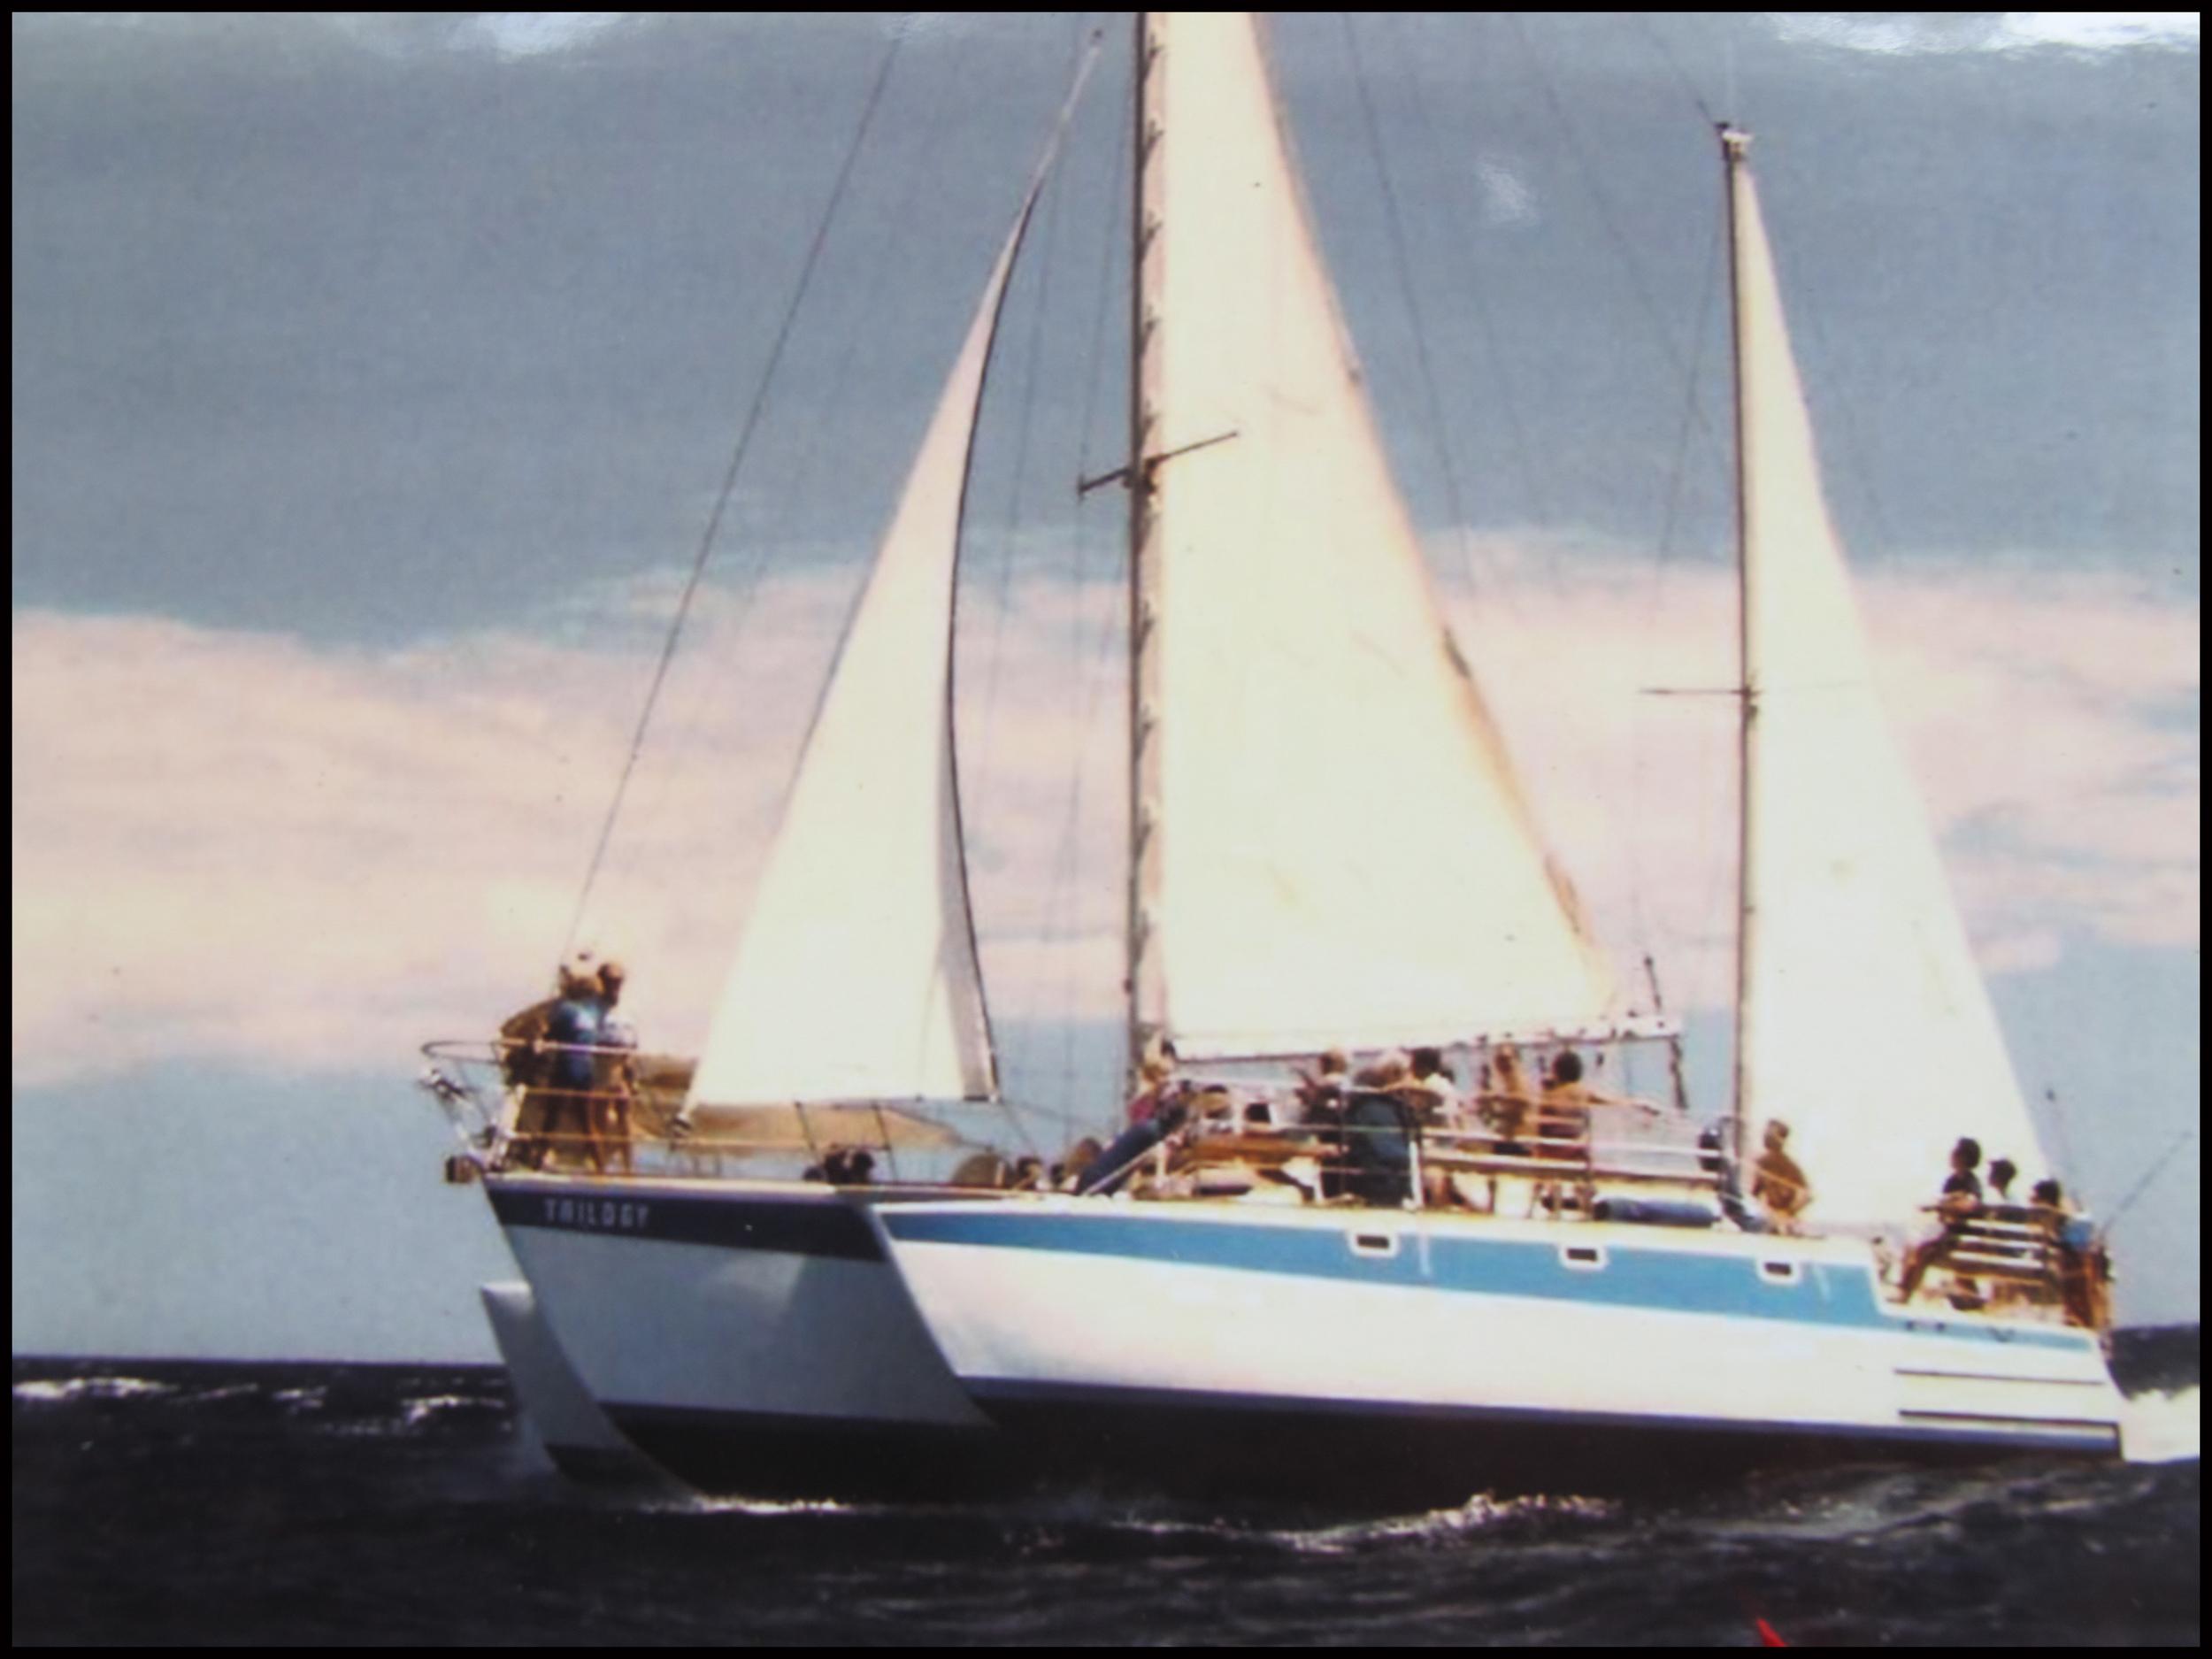 original Trilogy boat sailing in Maui